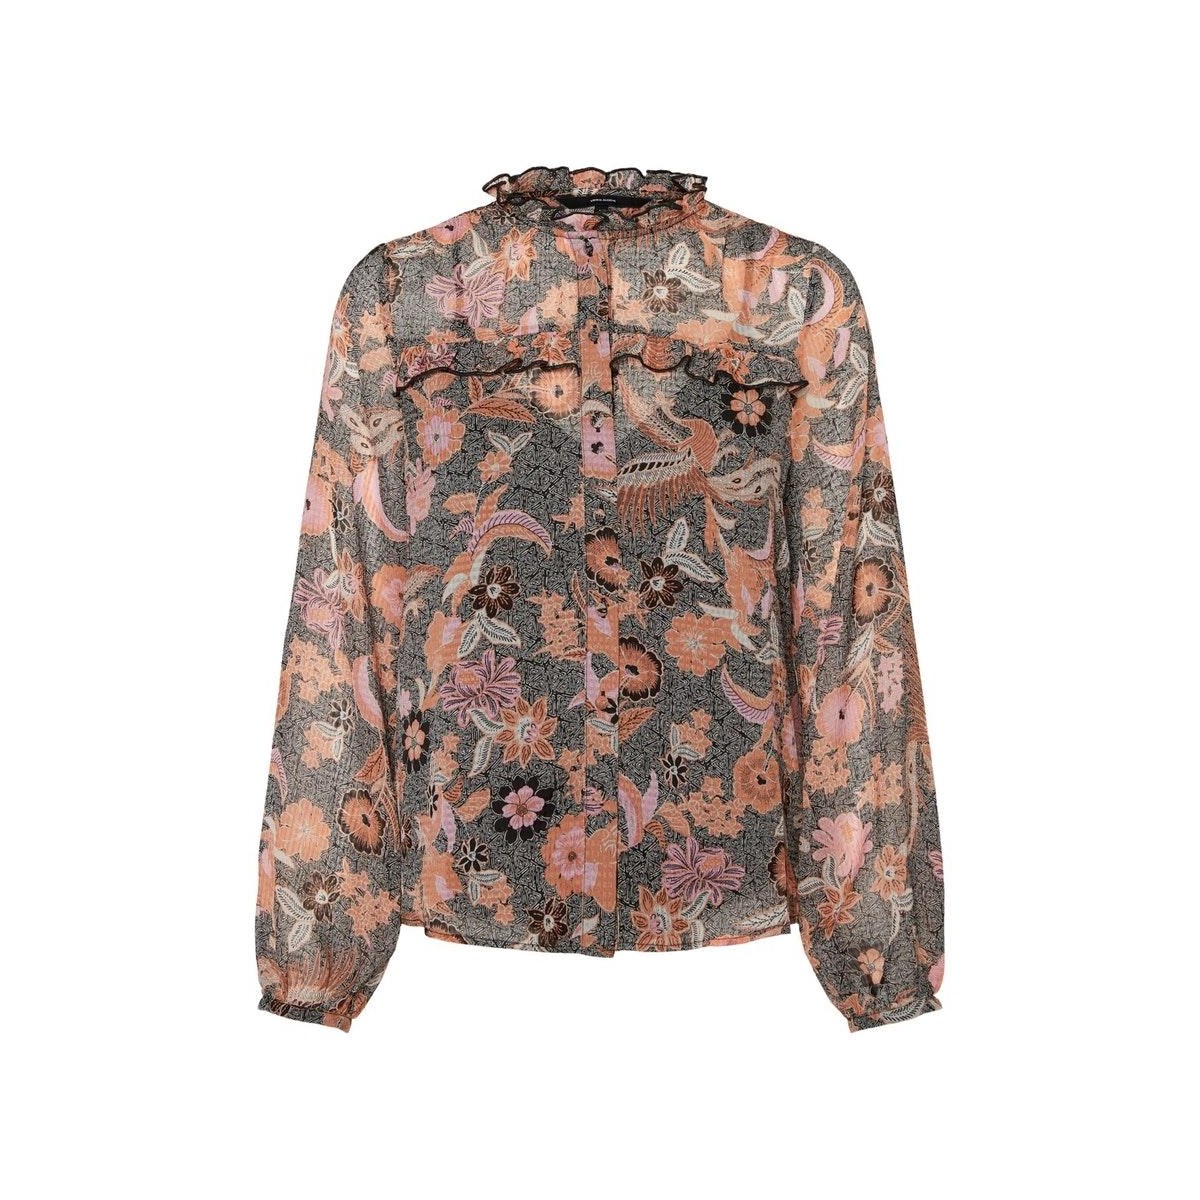 vmnuka l/s shirt wvn 10230393 vero moda blouse carnelian/nuka